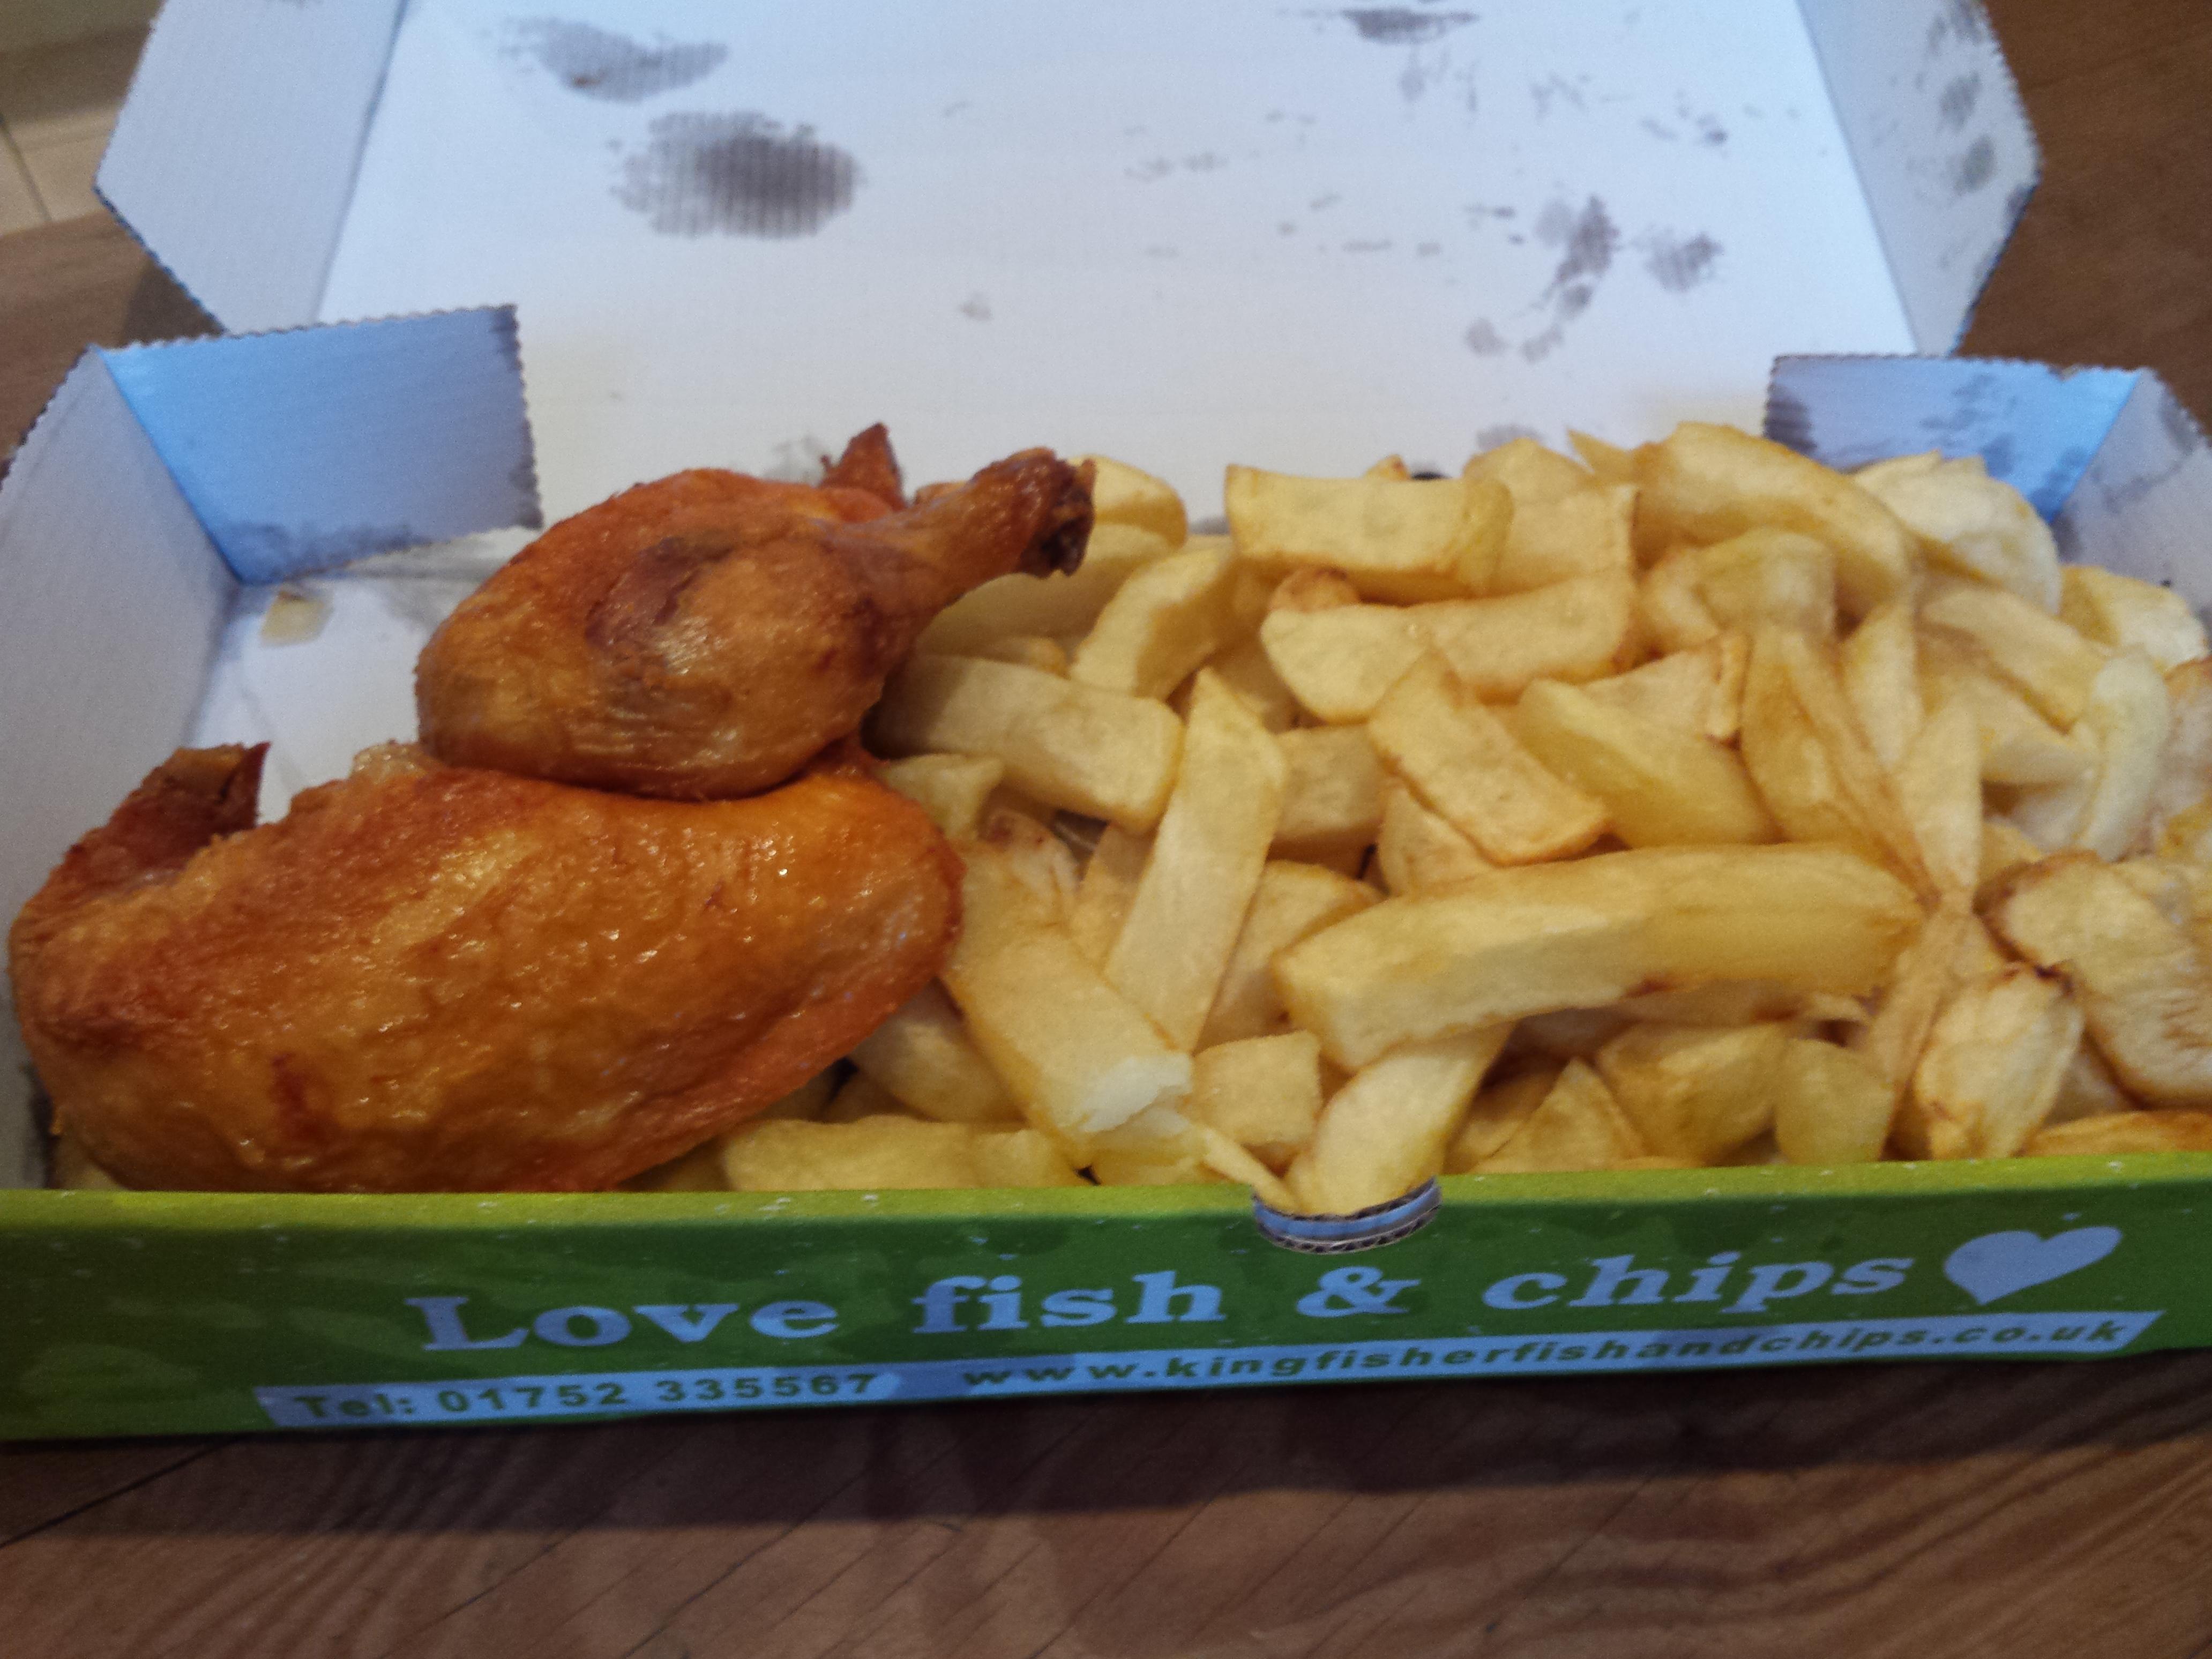 Kingfisher fish chips gluten free menu gluten free by for Gluten free fish and chips